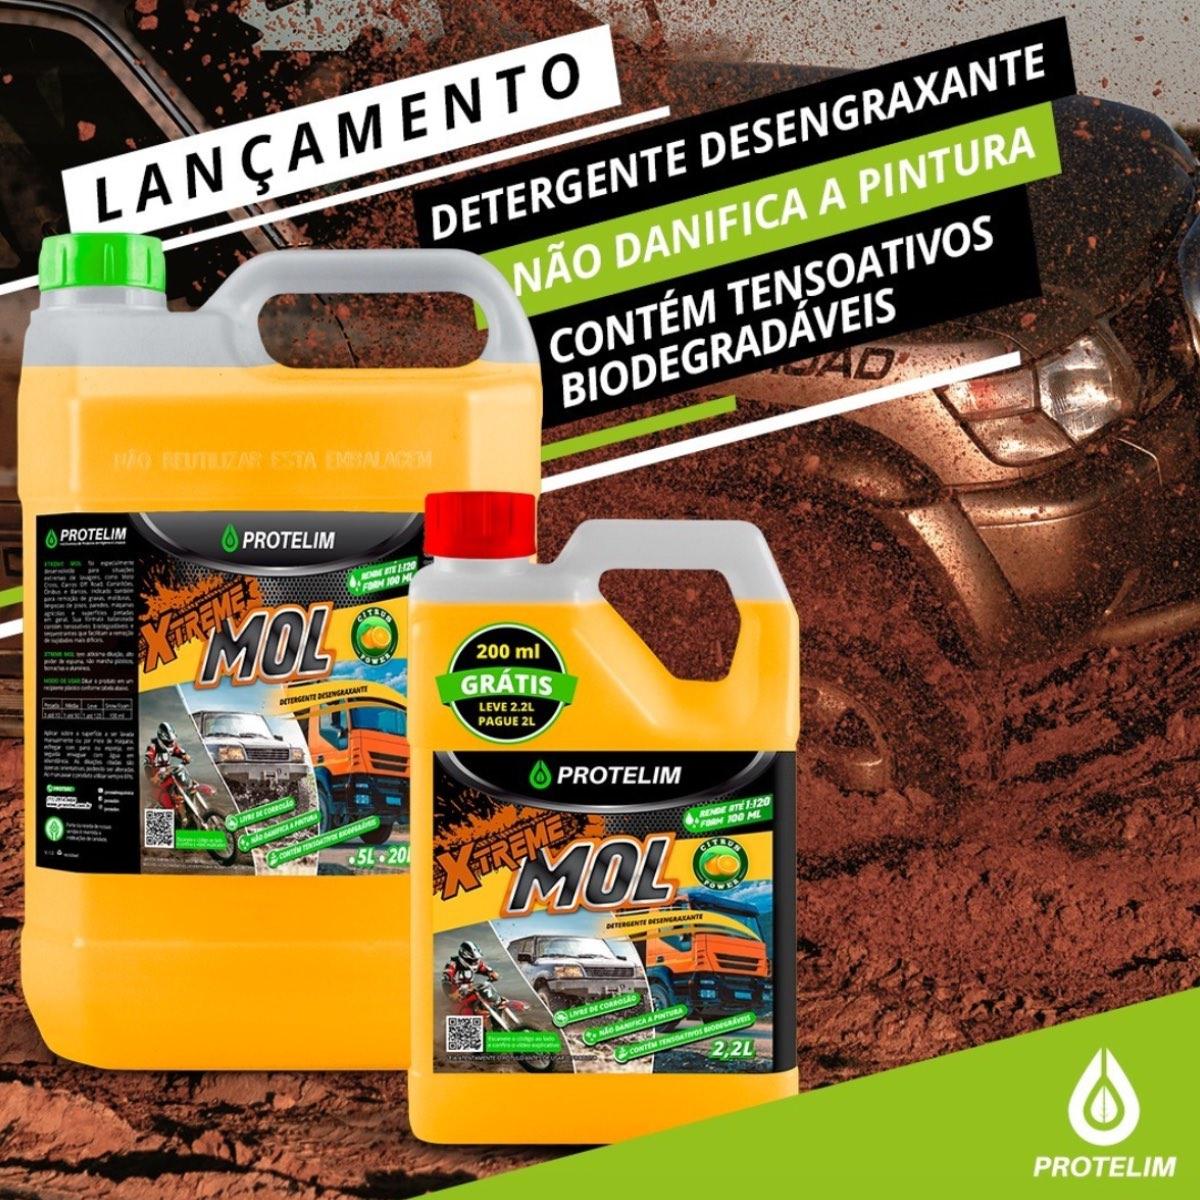 Xtreme Mol Detergente Desengraxante Automotivo Protelim 2,2L